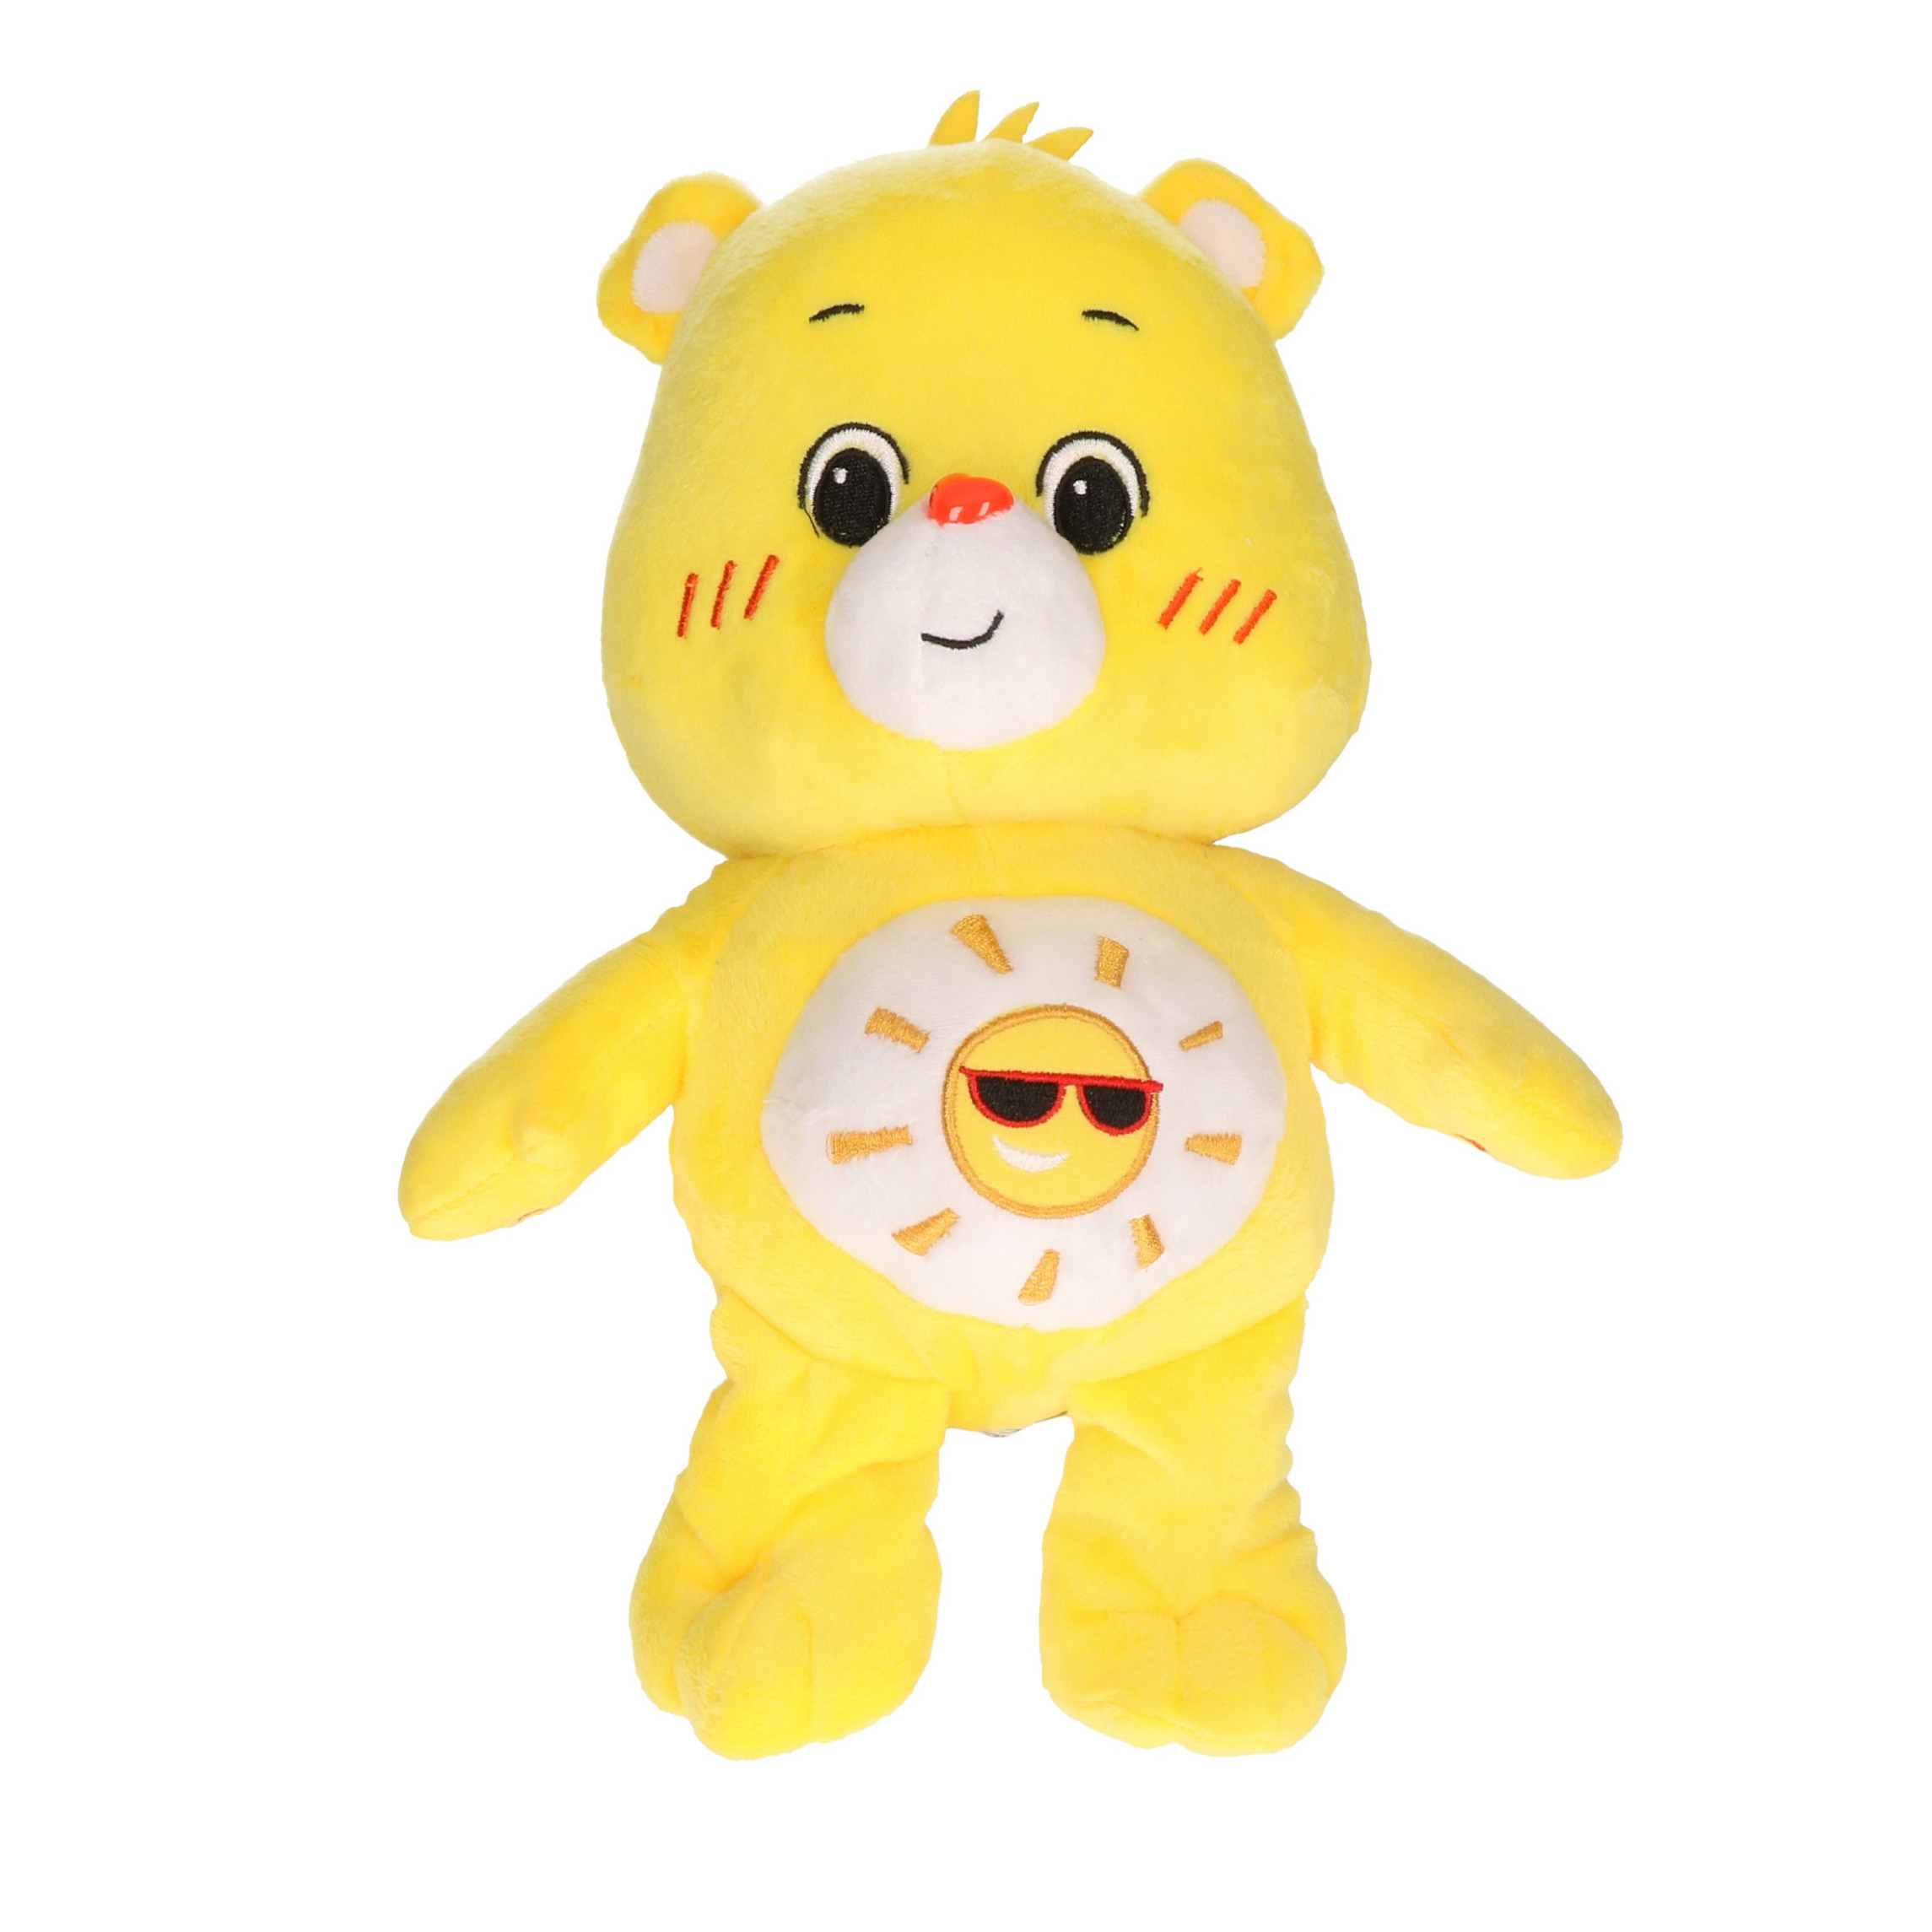 Pluche Troetelbeertje knuffel geel 28 cm